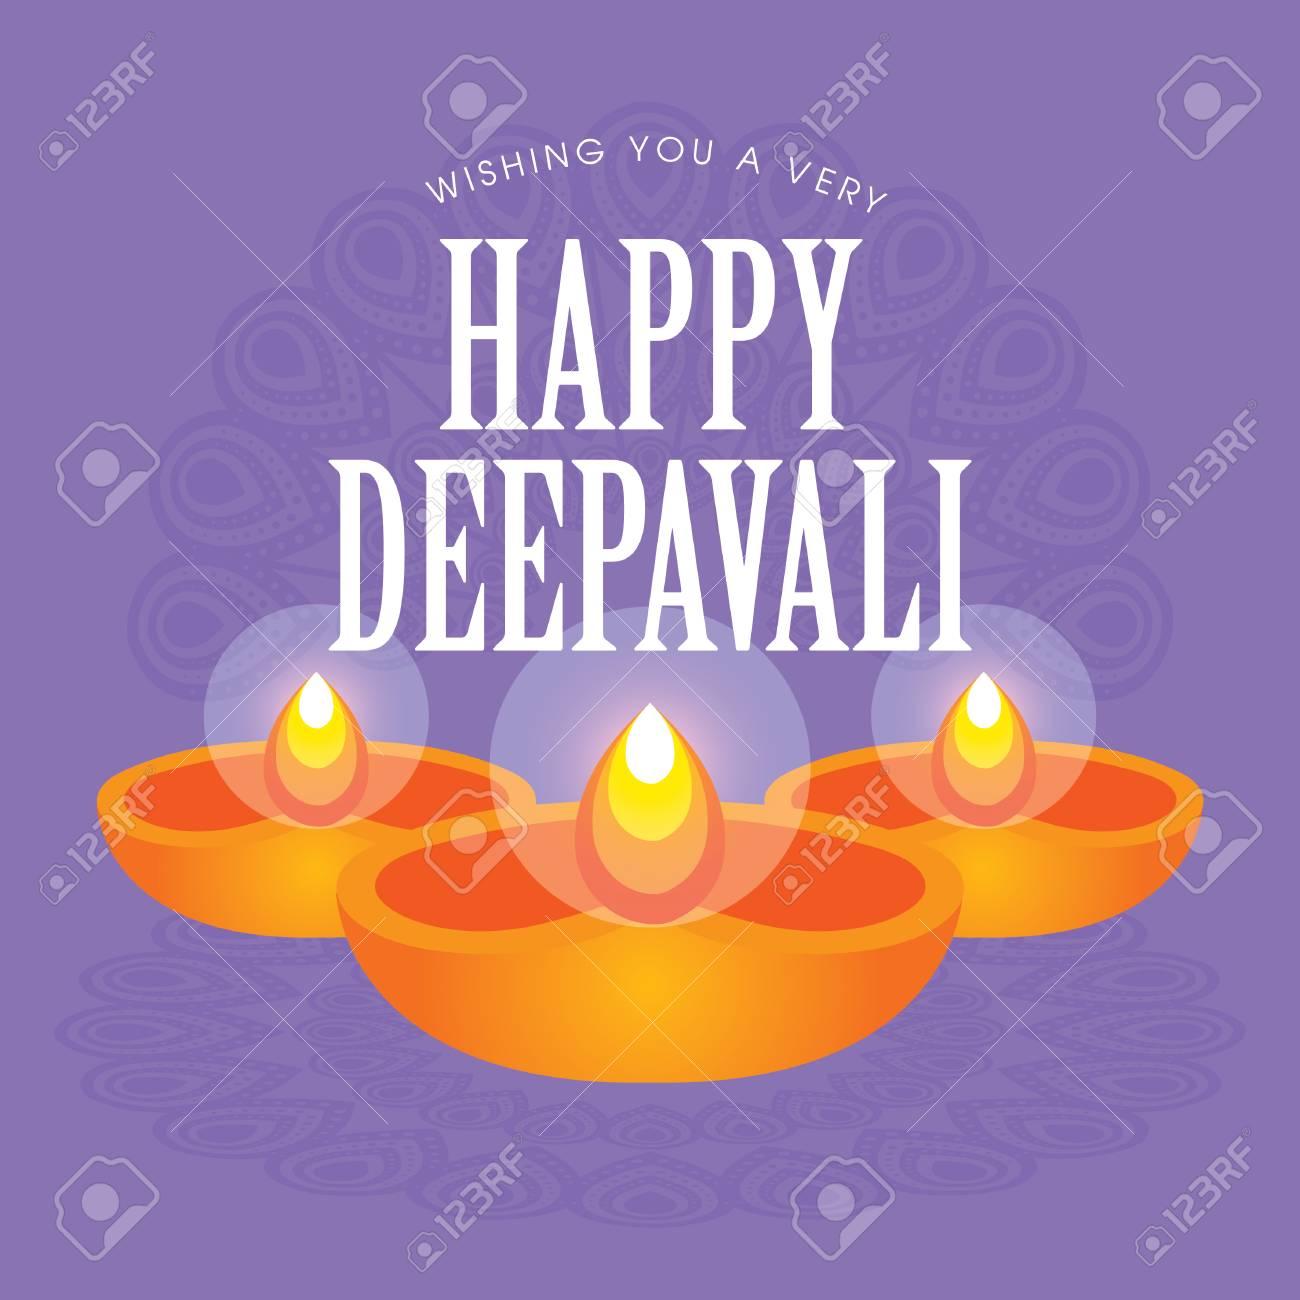 Diwali Or Deepavali Greetings Template With Beautiful Burning